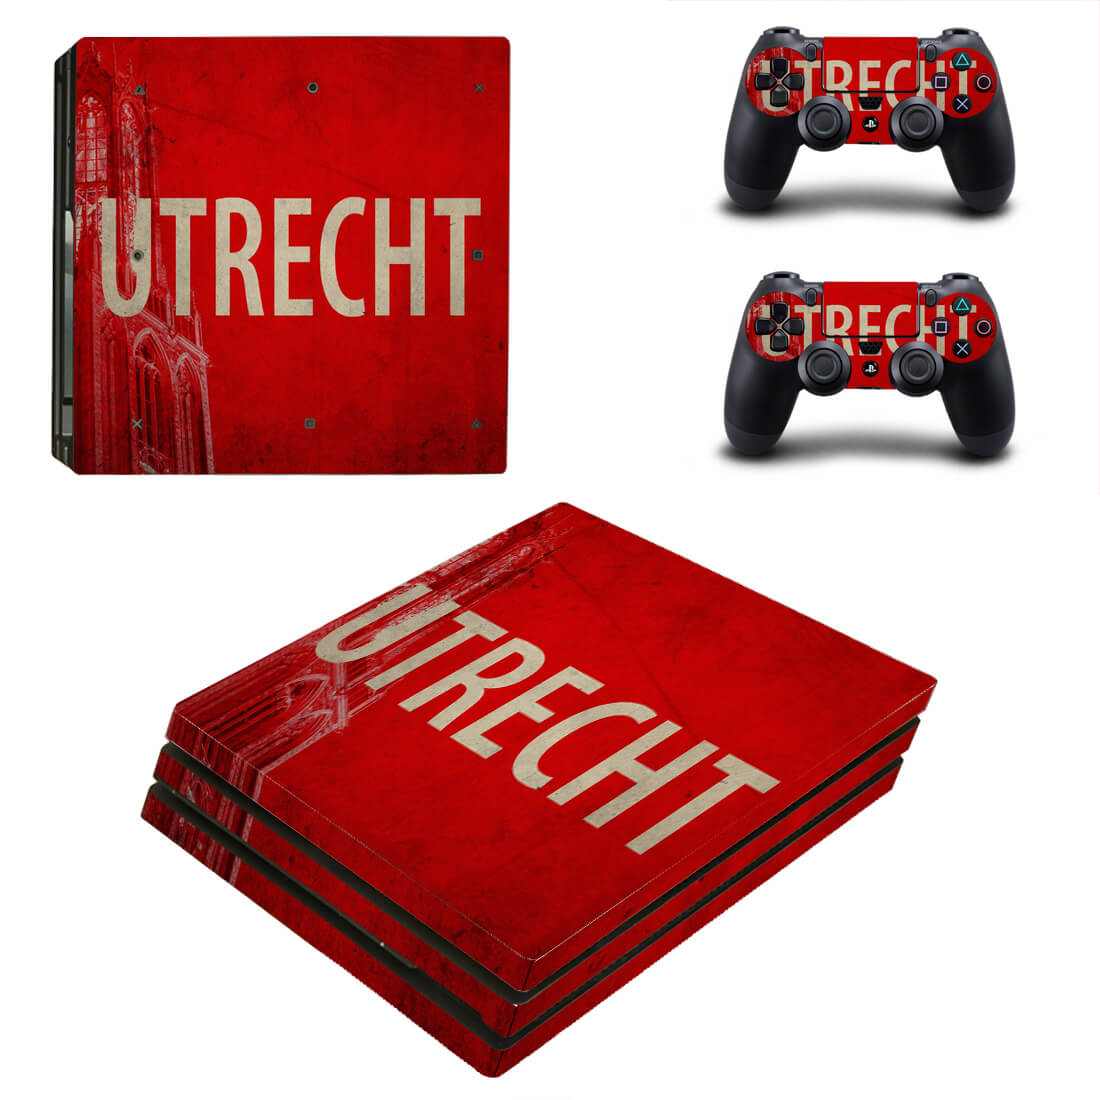 Utrecht PS4 Pro skin